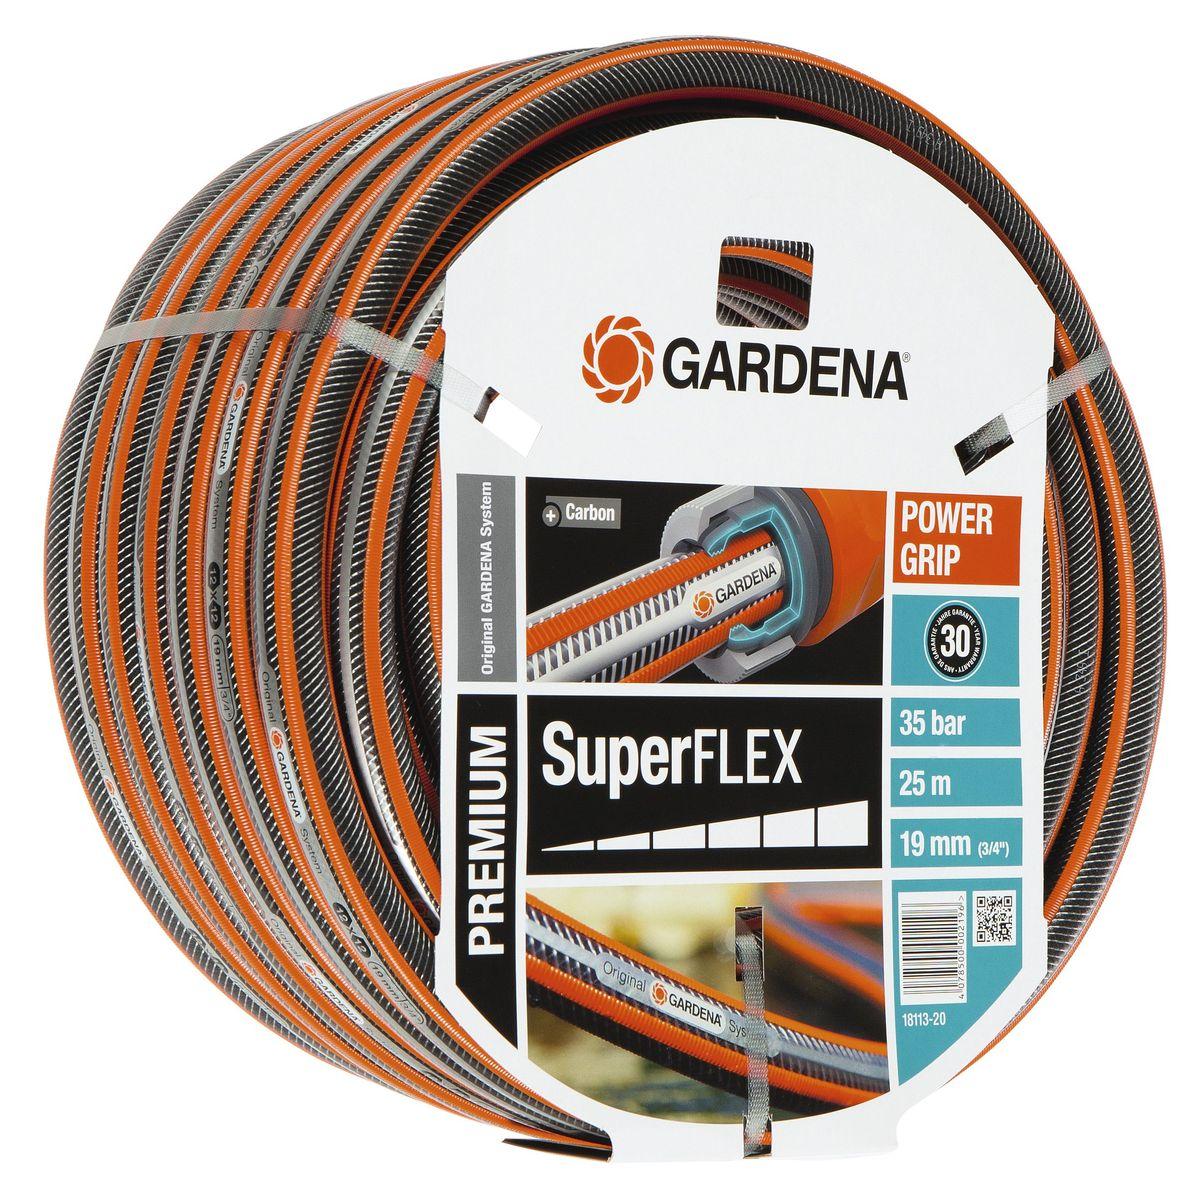 Шланг Gardena Superflex, диаметр 3/4, длина 25 м шланг raco classic 3 4x25m 40306 3 4 25